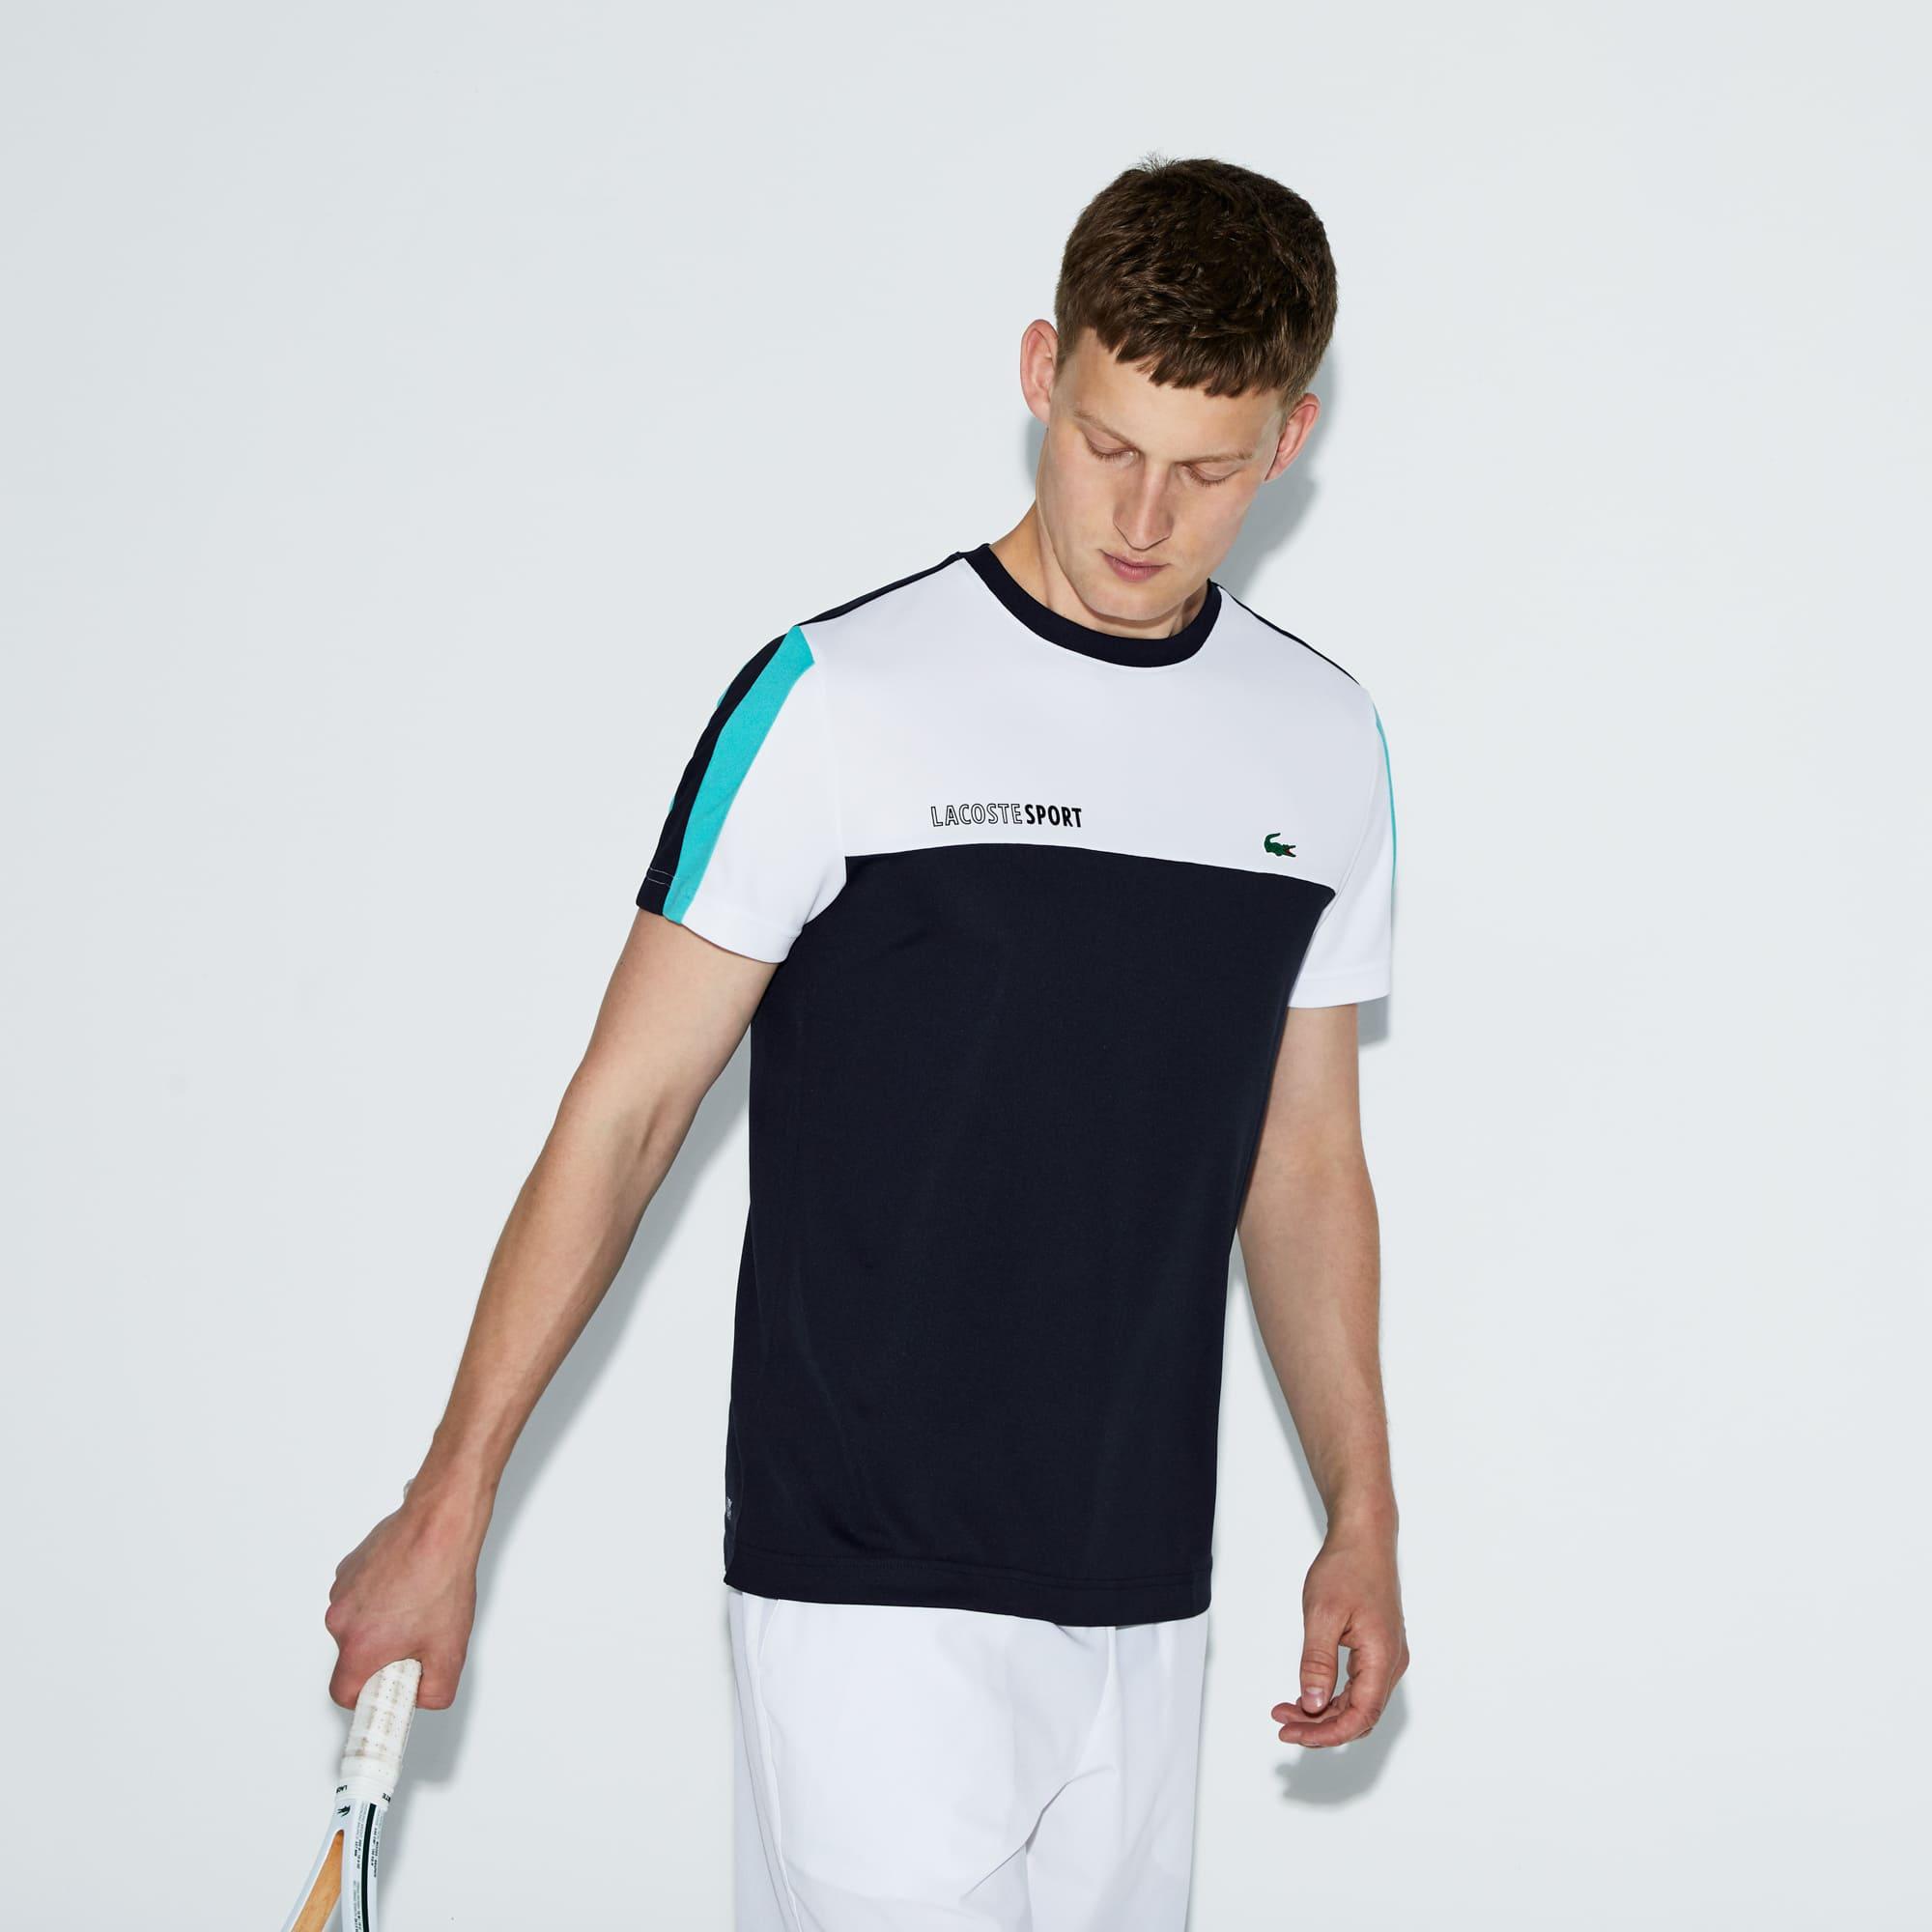 a294846708355 Camiseta masculina Lacoste SPORT tennis decote careca Colorblock em piquet